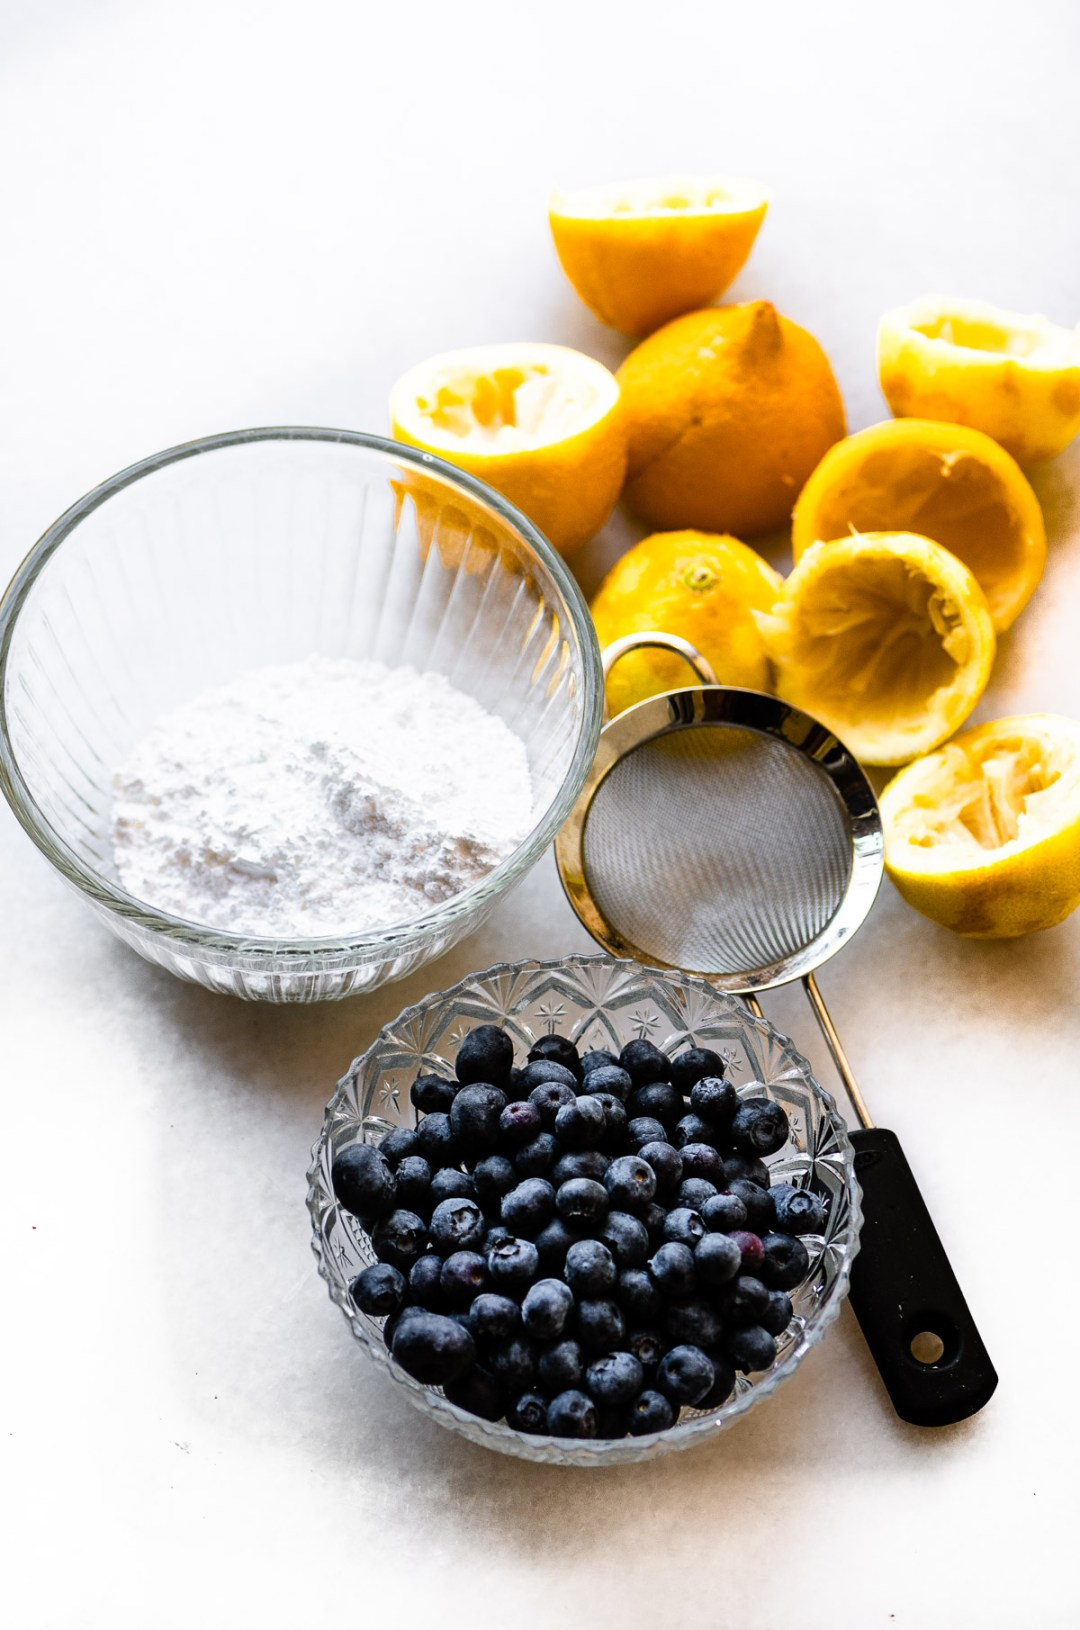 lemons, blueberries, and powdered sugar for a flourless warm lemon pudding cake recipe